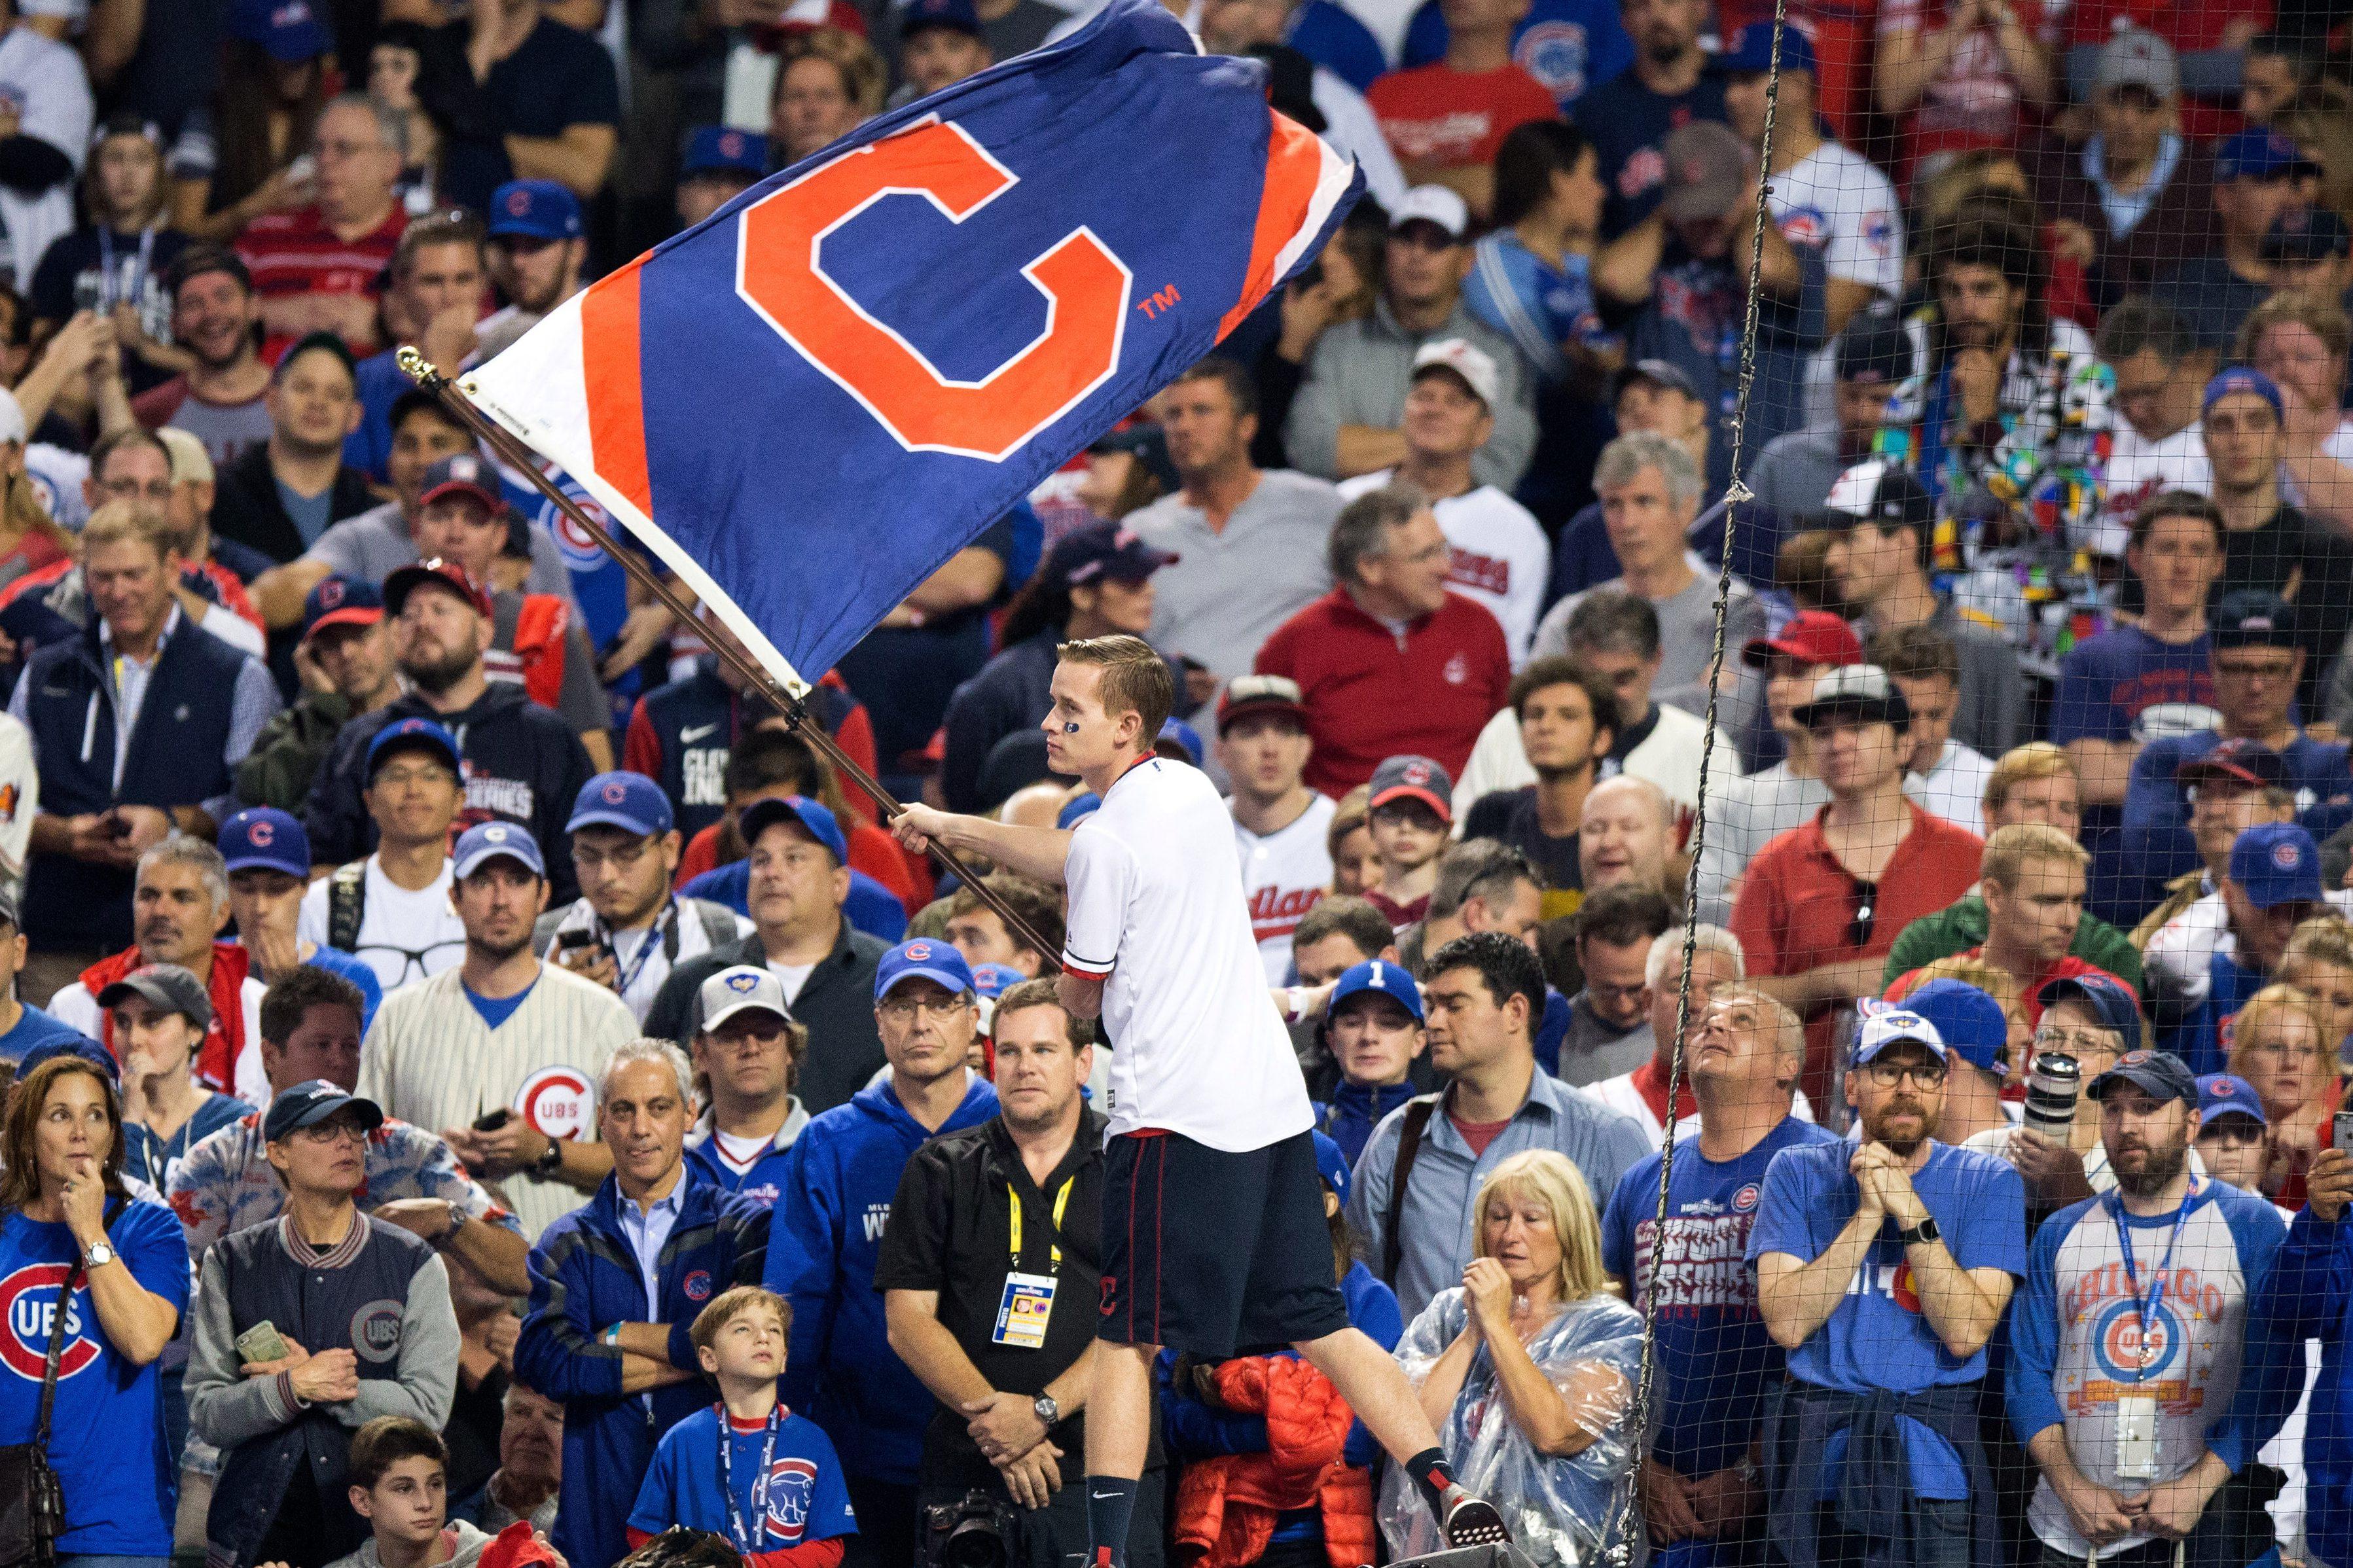 MLB: NOV 02 World Series – Game 7 – Cubs at Indians